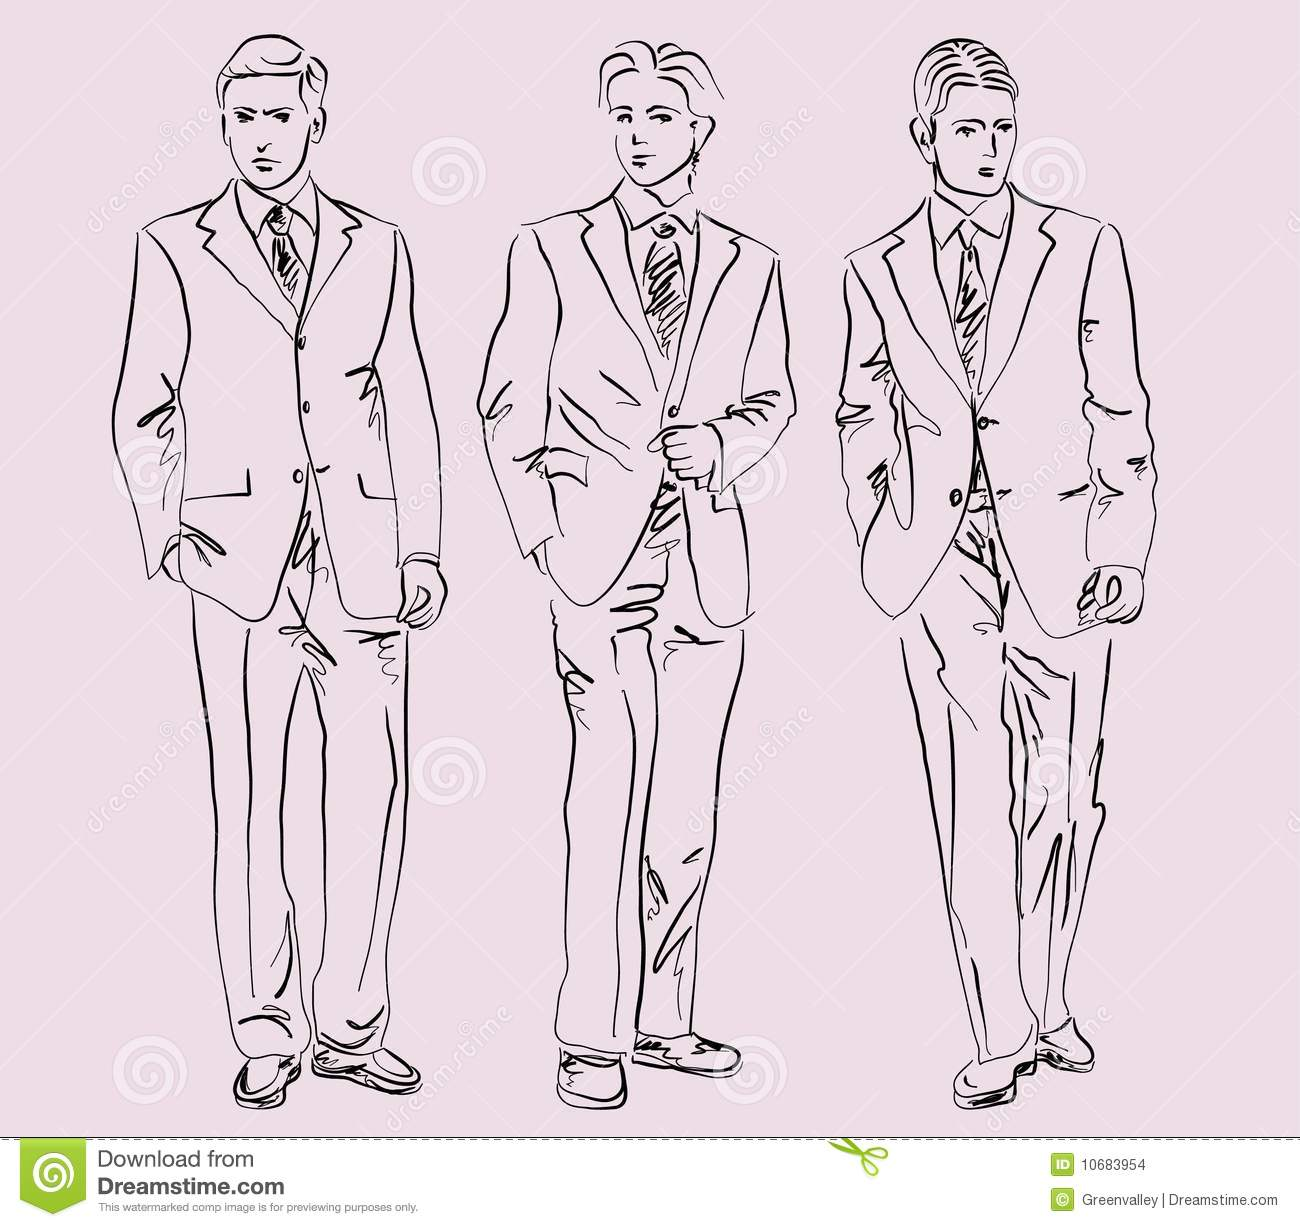 Drawn suit sketch man Sketch suit jpg sketch suit